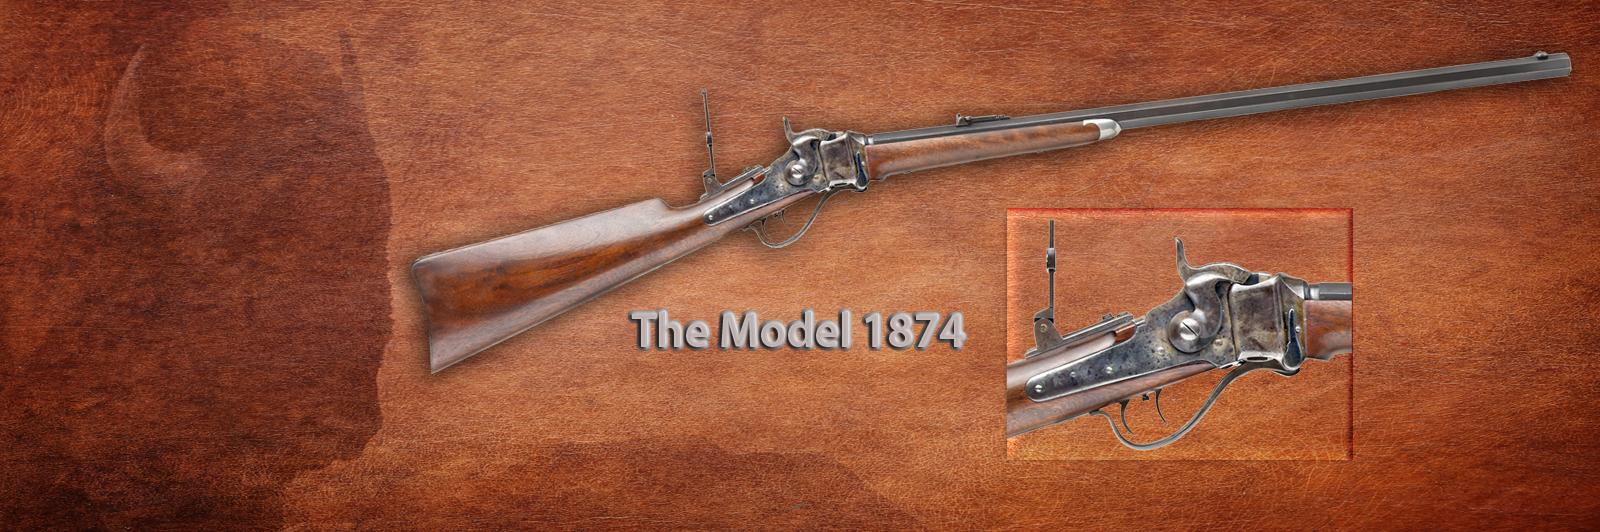 Model 1874 Rifle